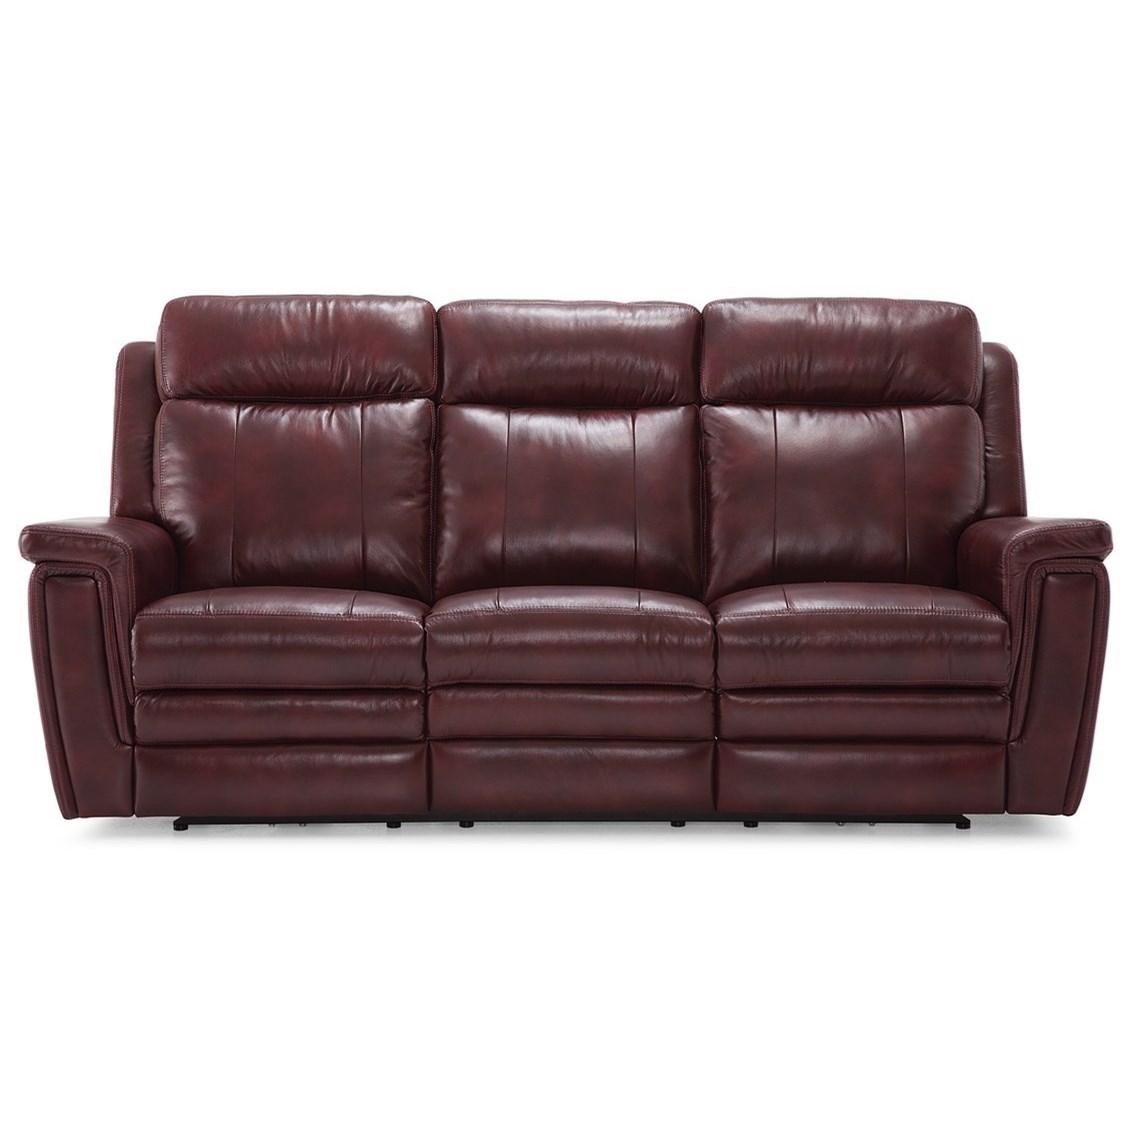 Asher Sofa Power Recliner w/ Pwr HR & Lumbar by Palliser at Jordan's Home Furnishings